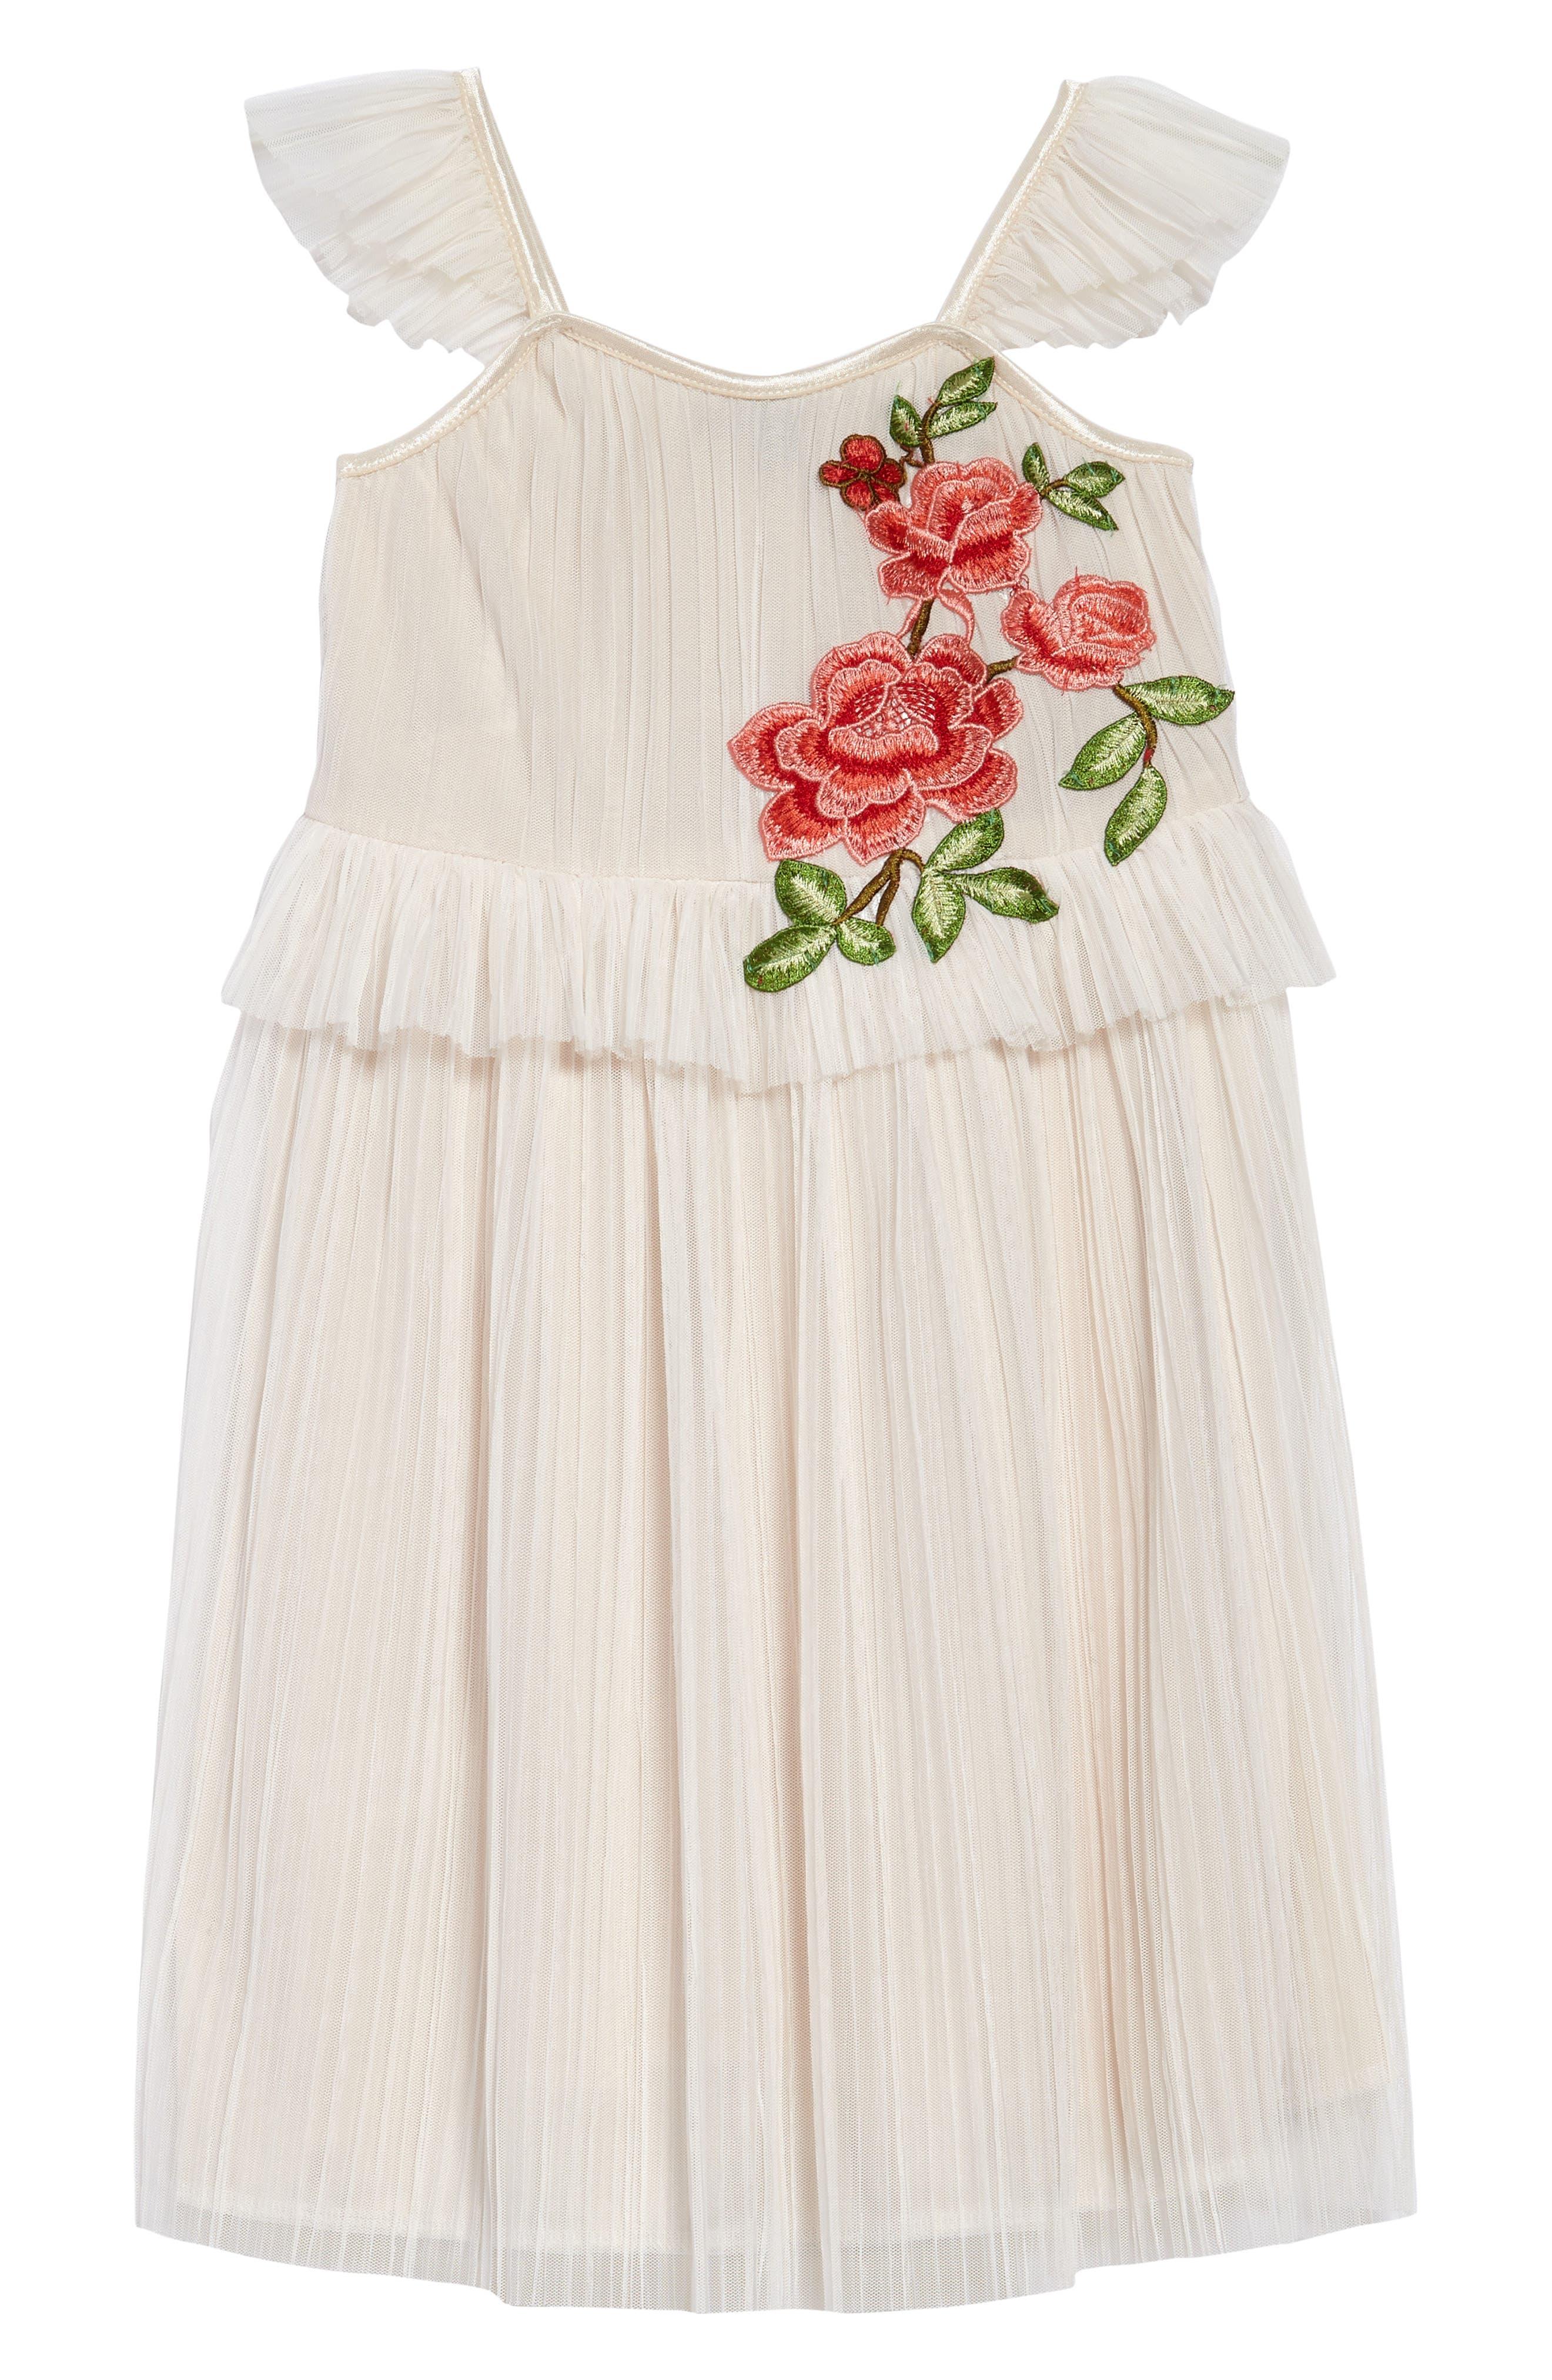 AVA & YELLY,                             Accordion Pleated Dress,                             Main thumbnail 1, color,                             250